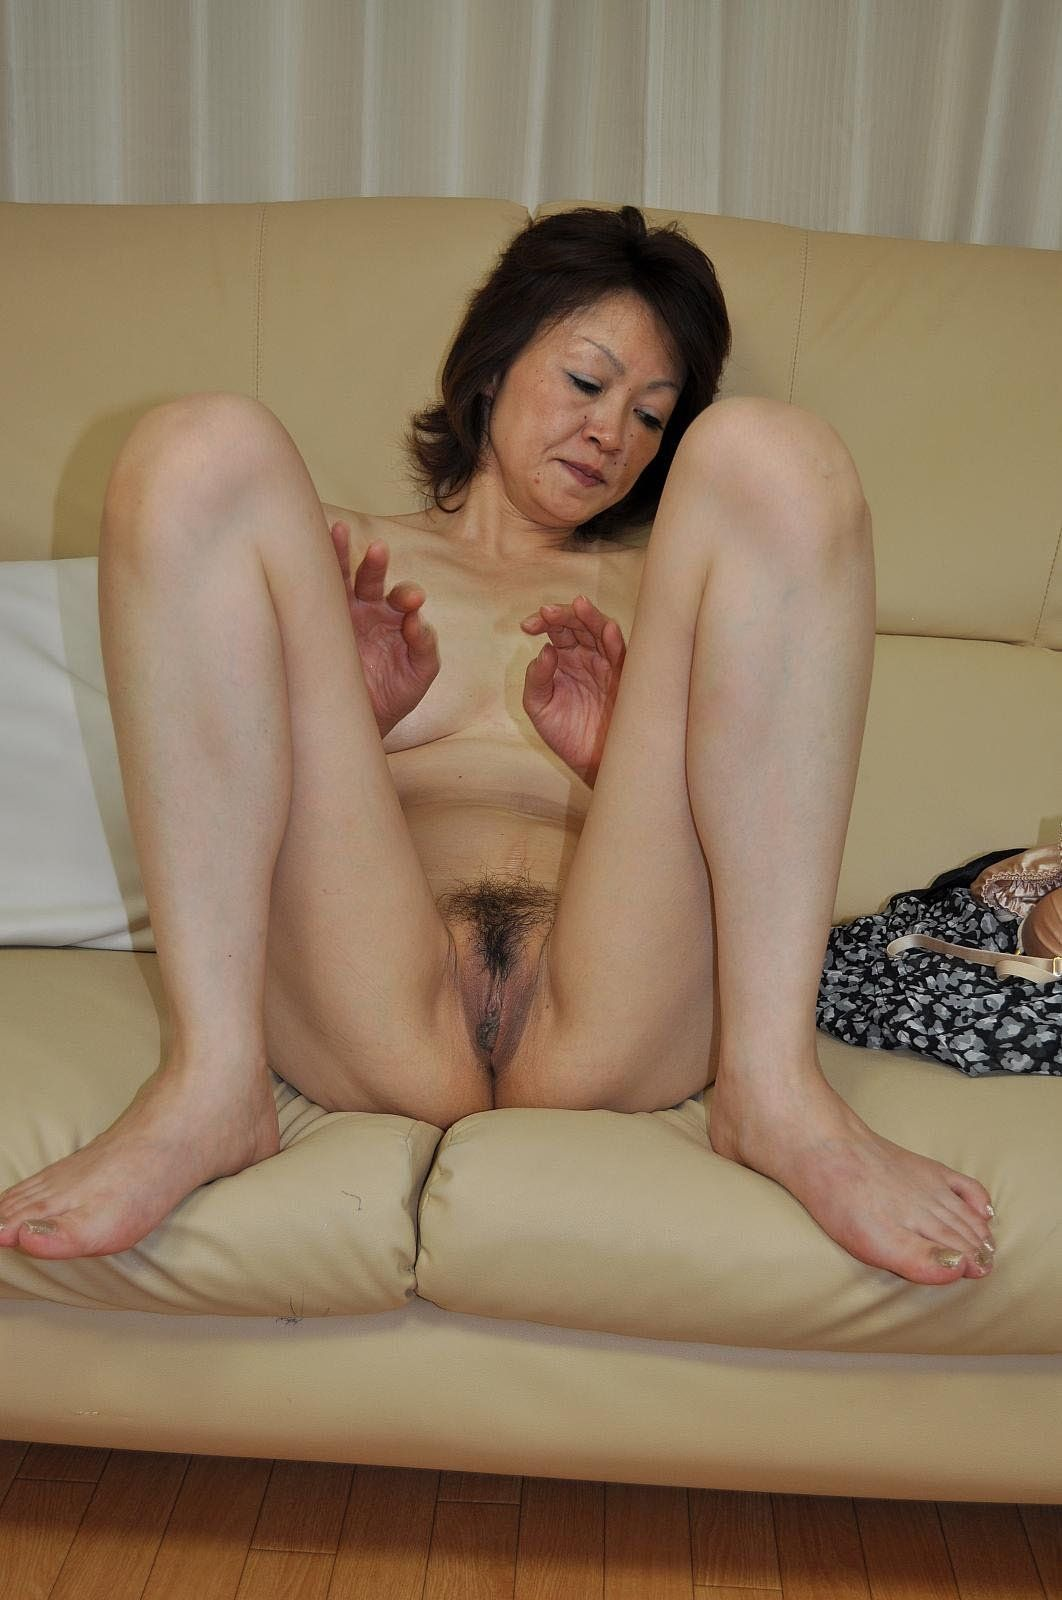 All Granny Porn japanese granny pussy. hd porno free photos.